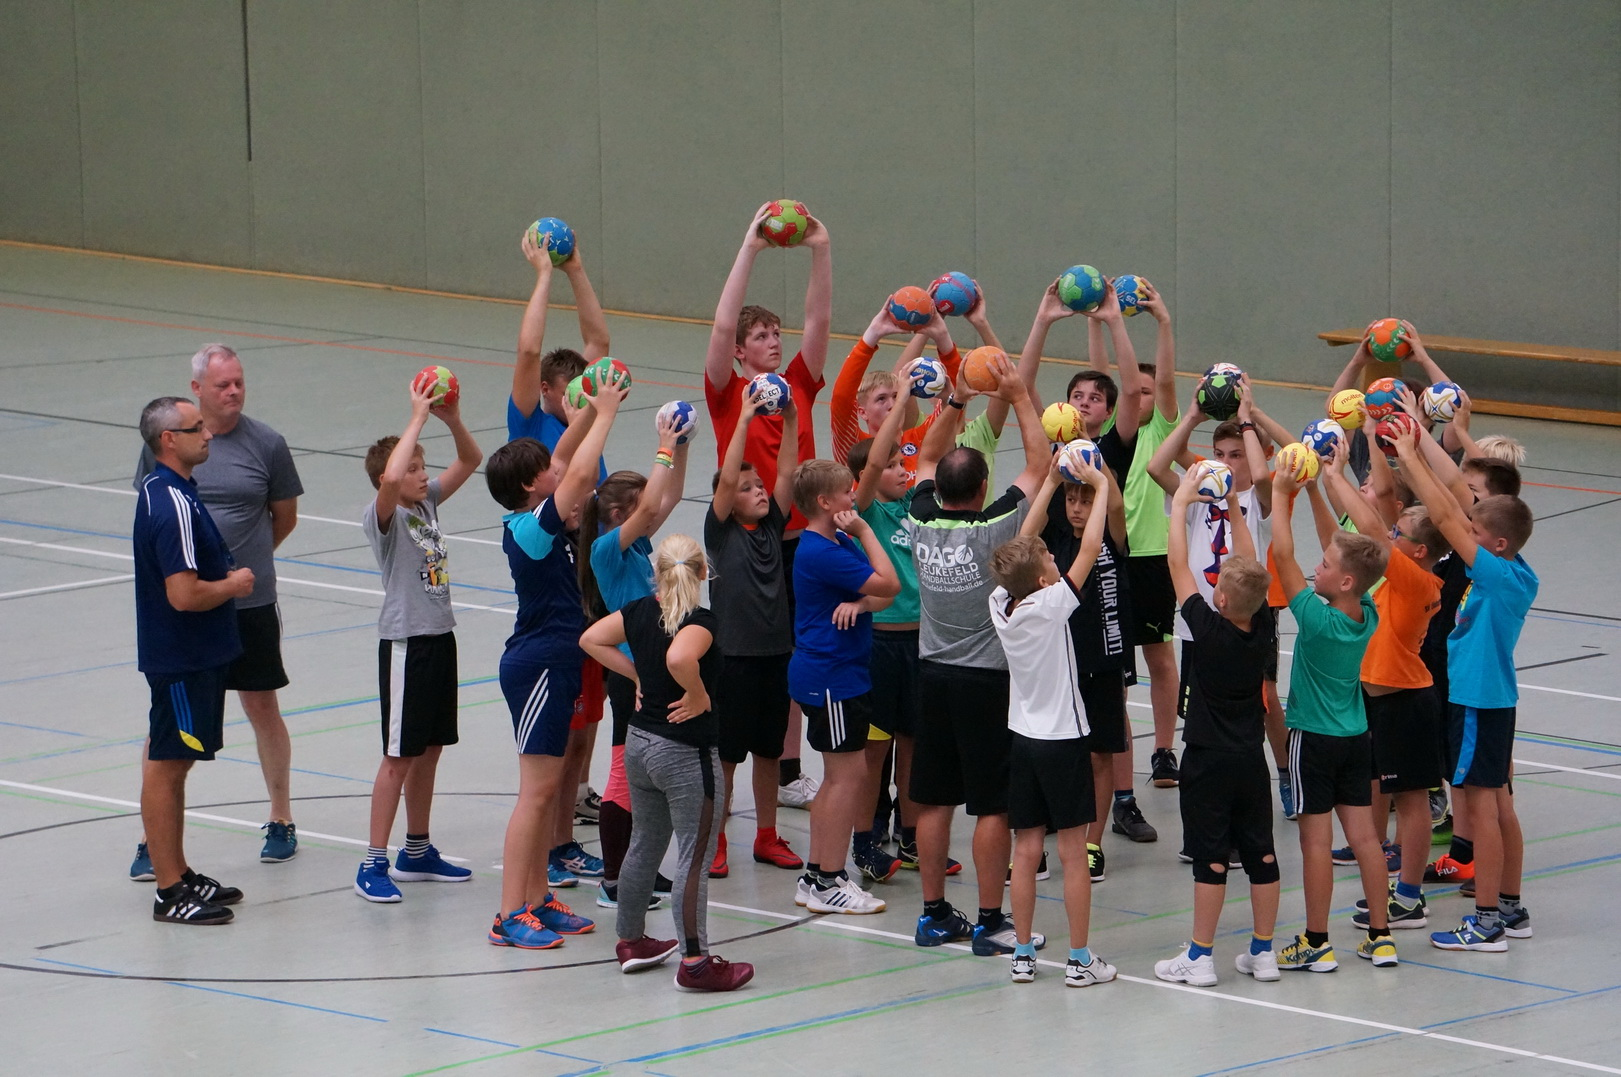 201808_Handballcamp_SDH_MG_086w